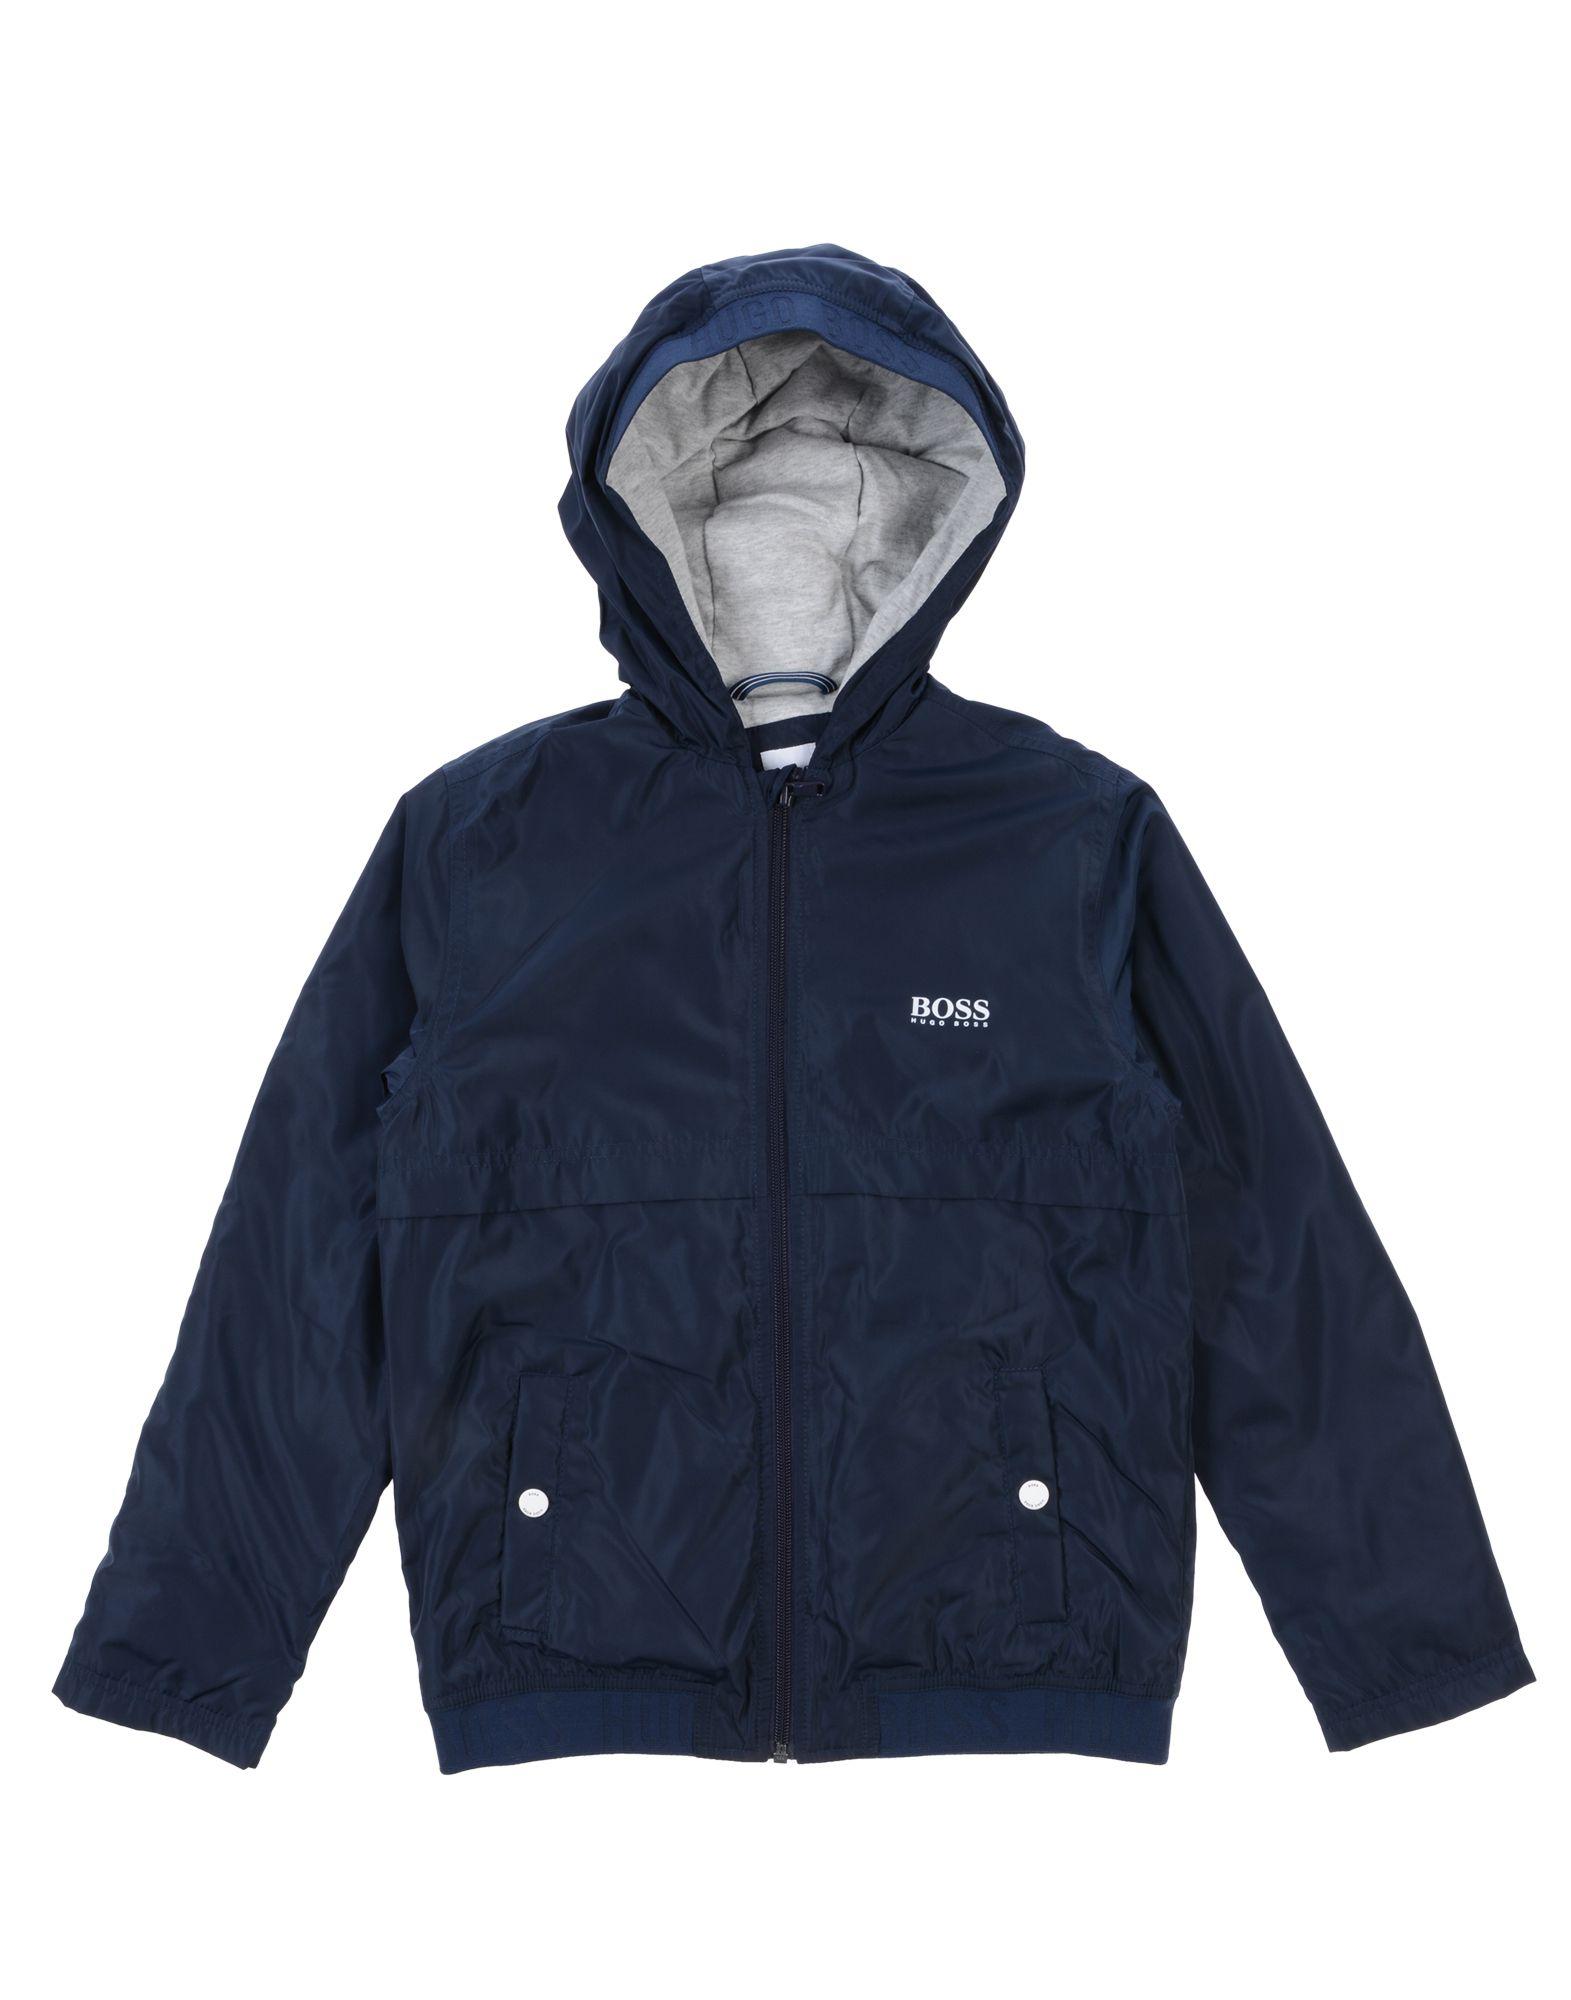 BOSS Jackets